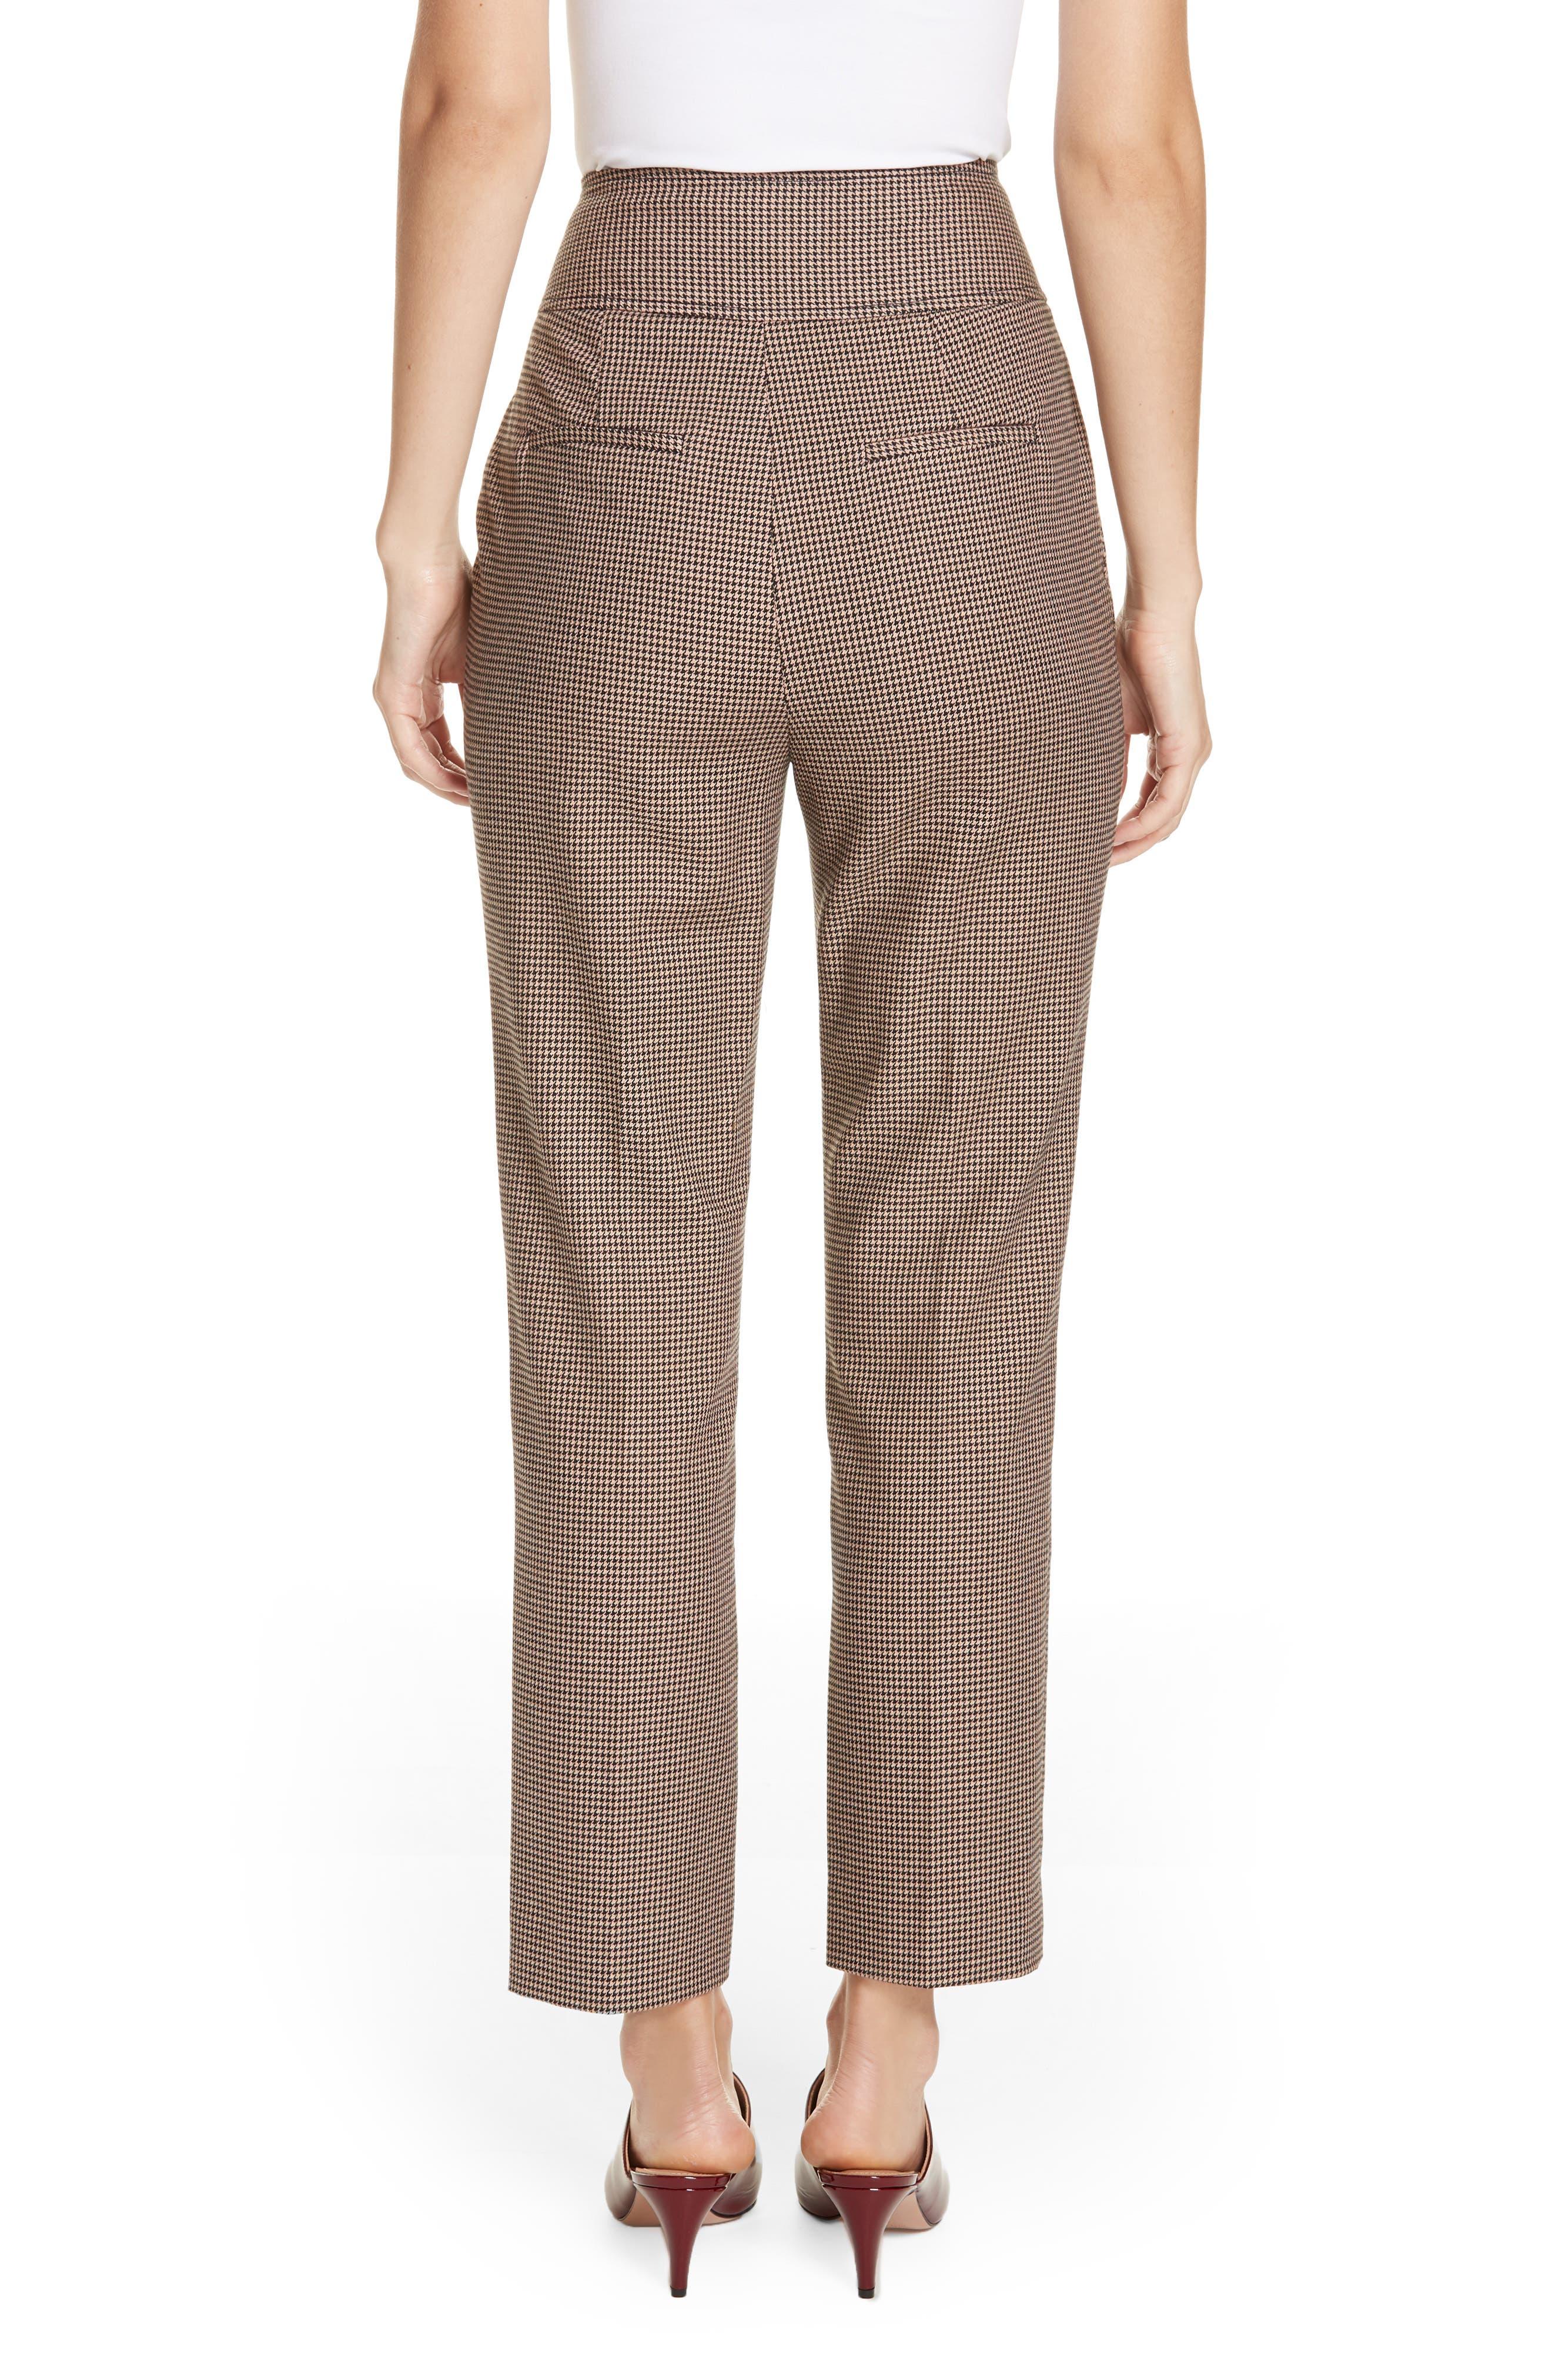 Houndstooth Check Stretch Cotton Blend Pants,                             Alternate thumbnail 2, color,                             CAMEL/ BLACK